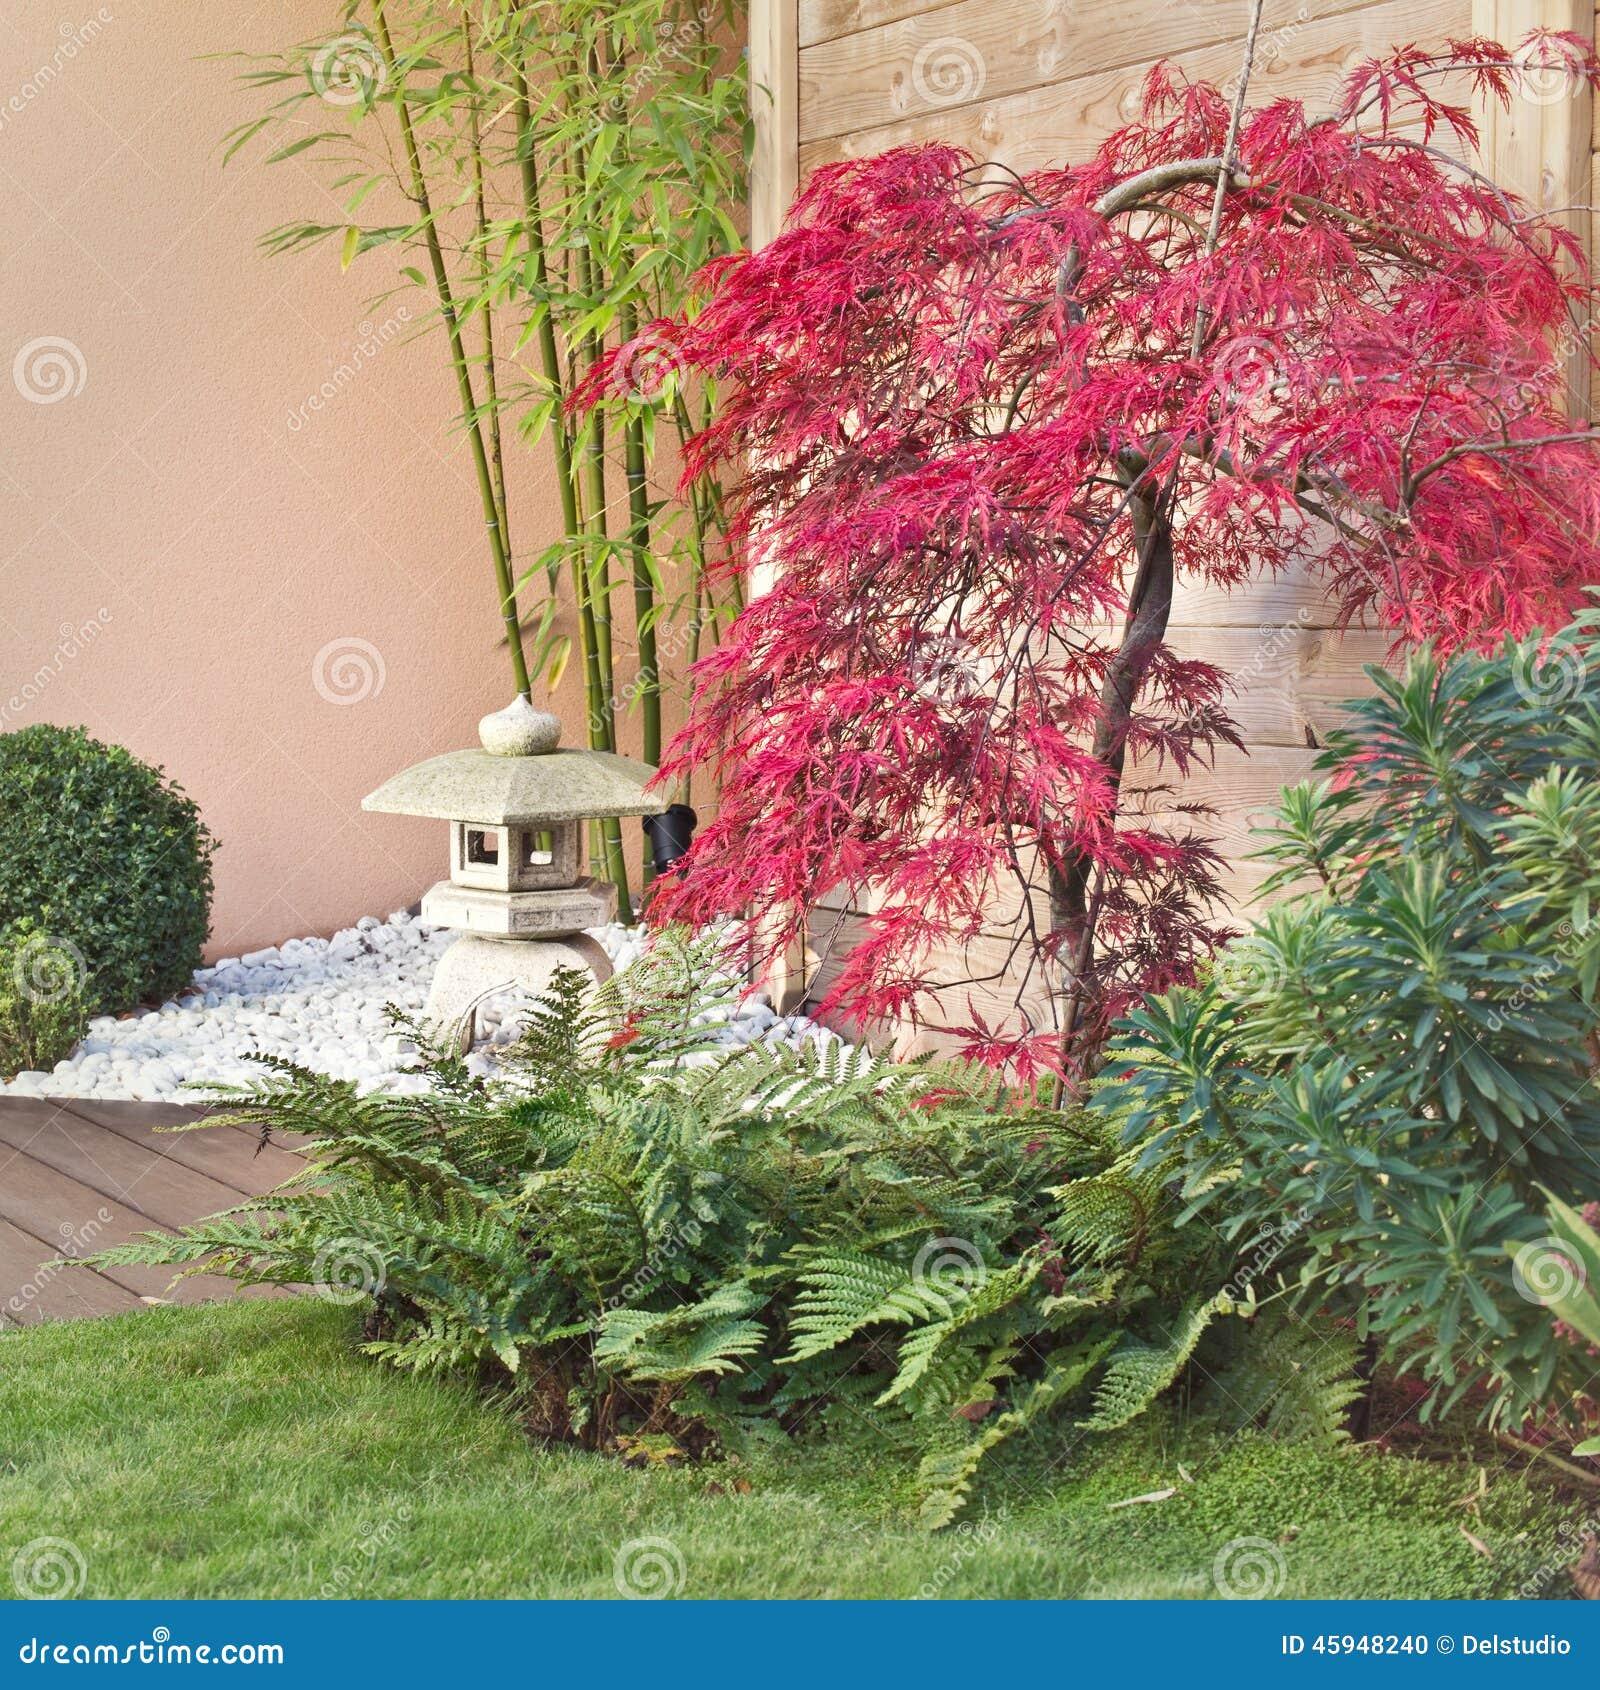 Rbol de arce japon s rojo foto de archivo imagen 45948240 for Arbol rojo jardin